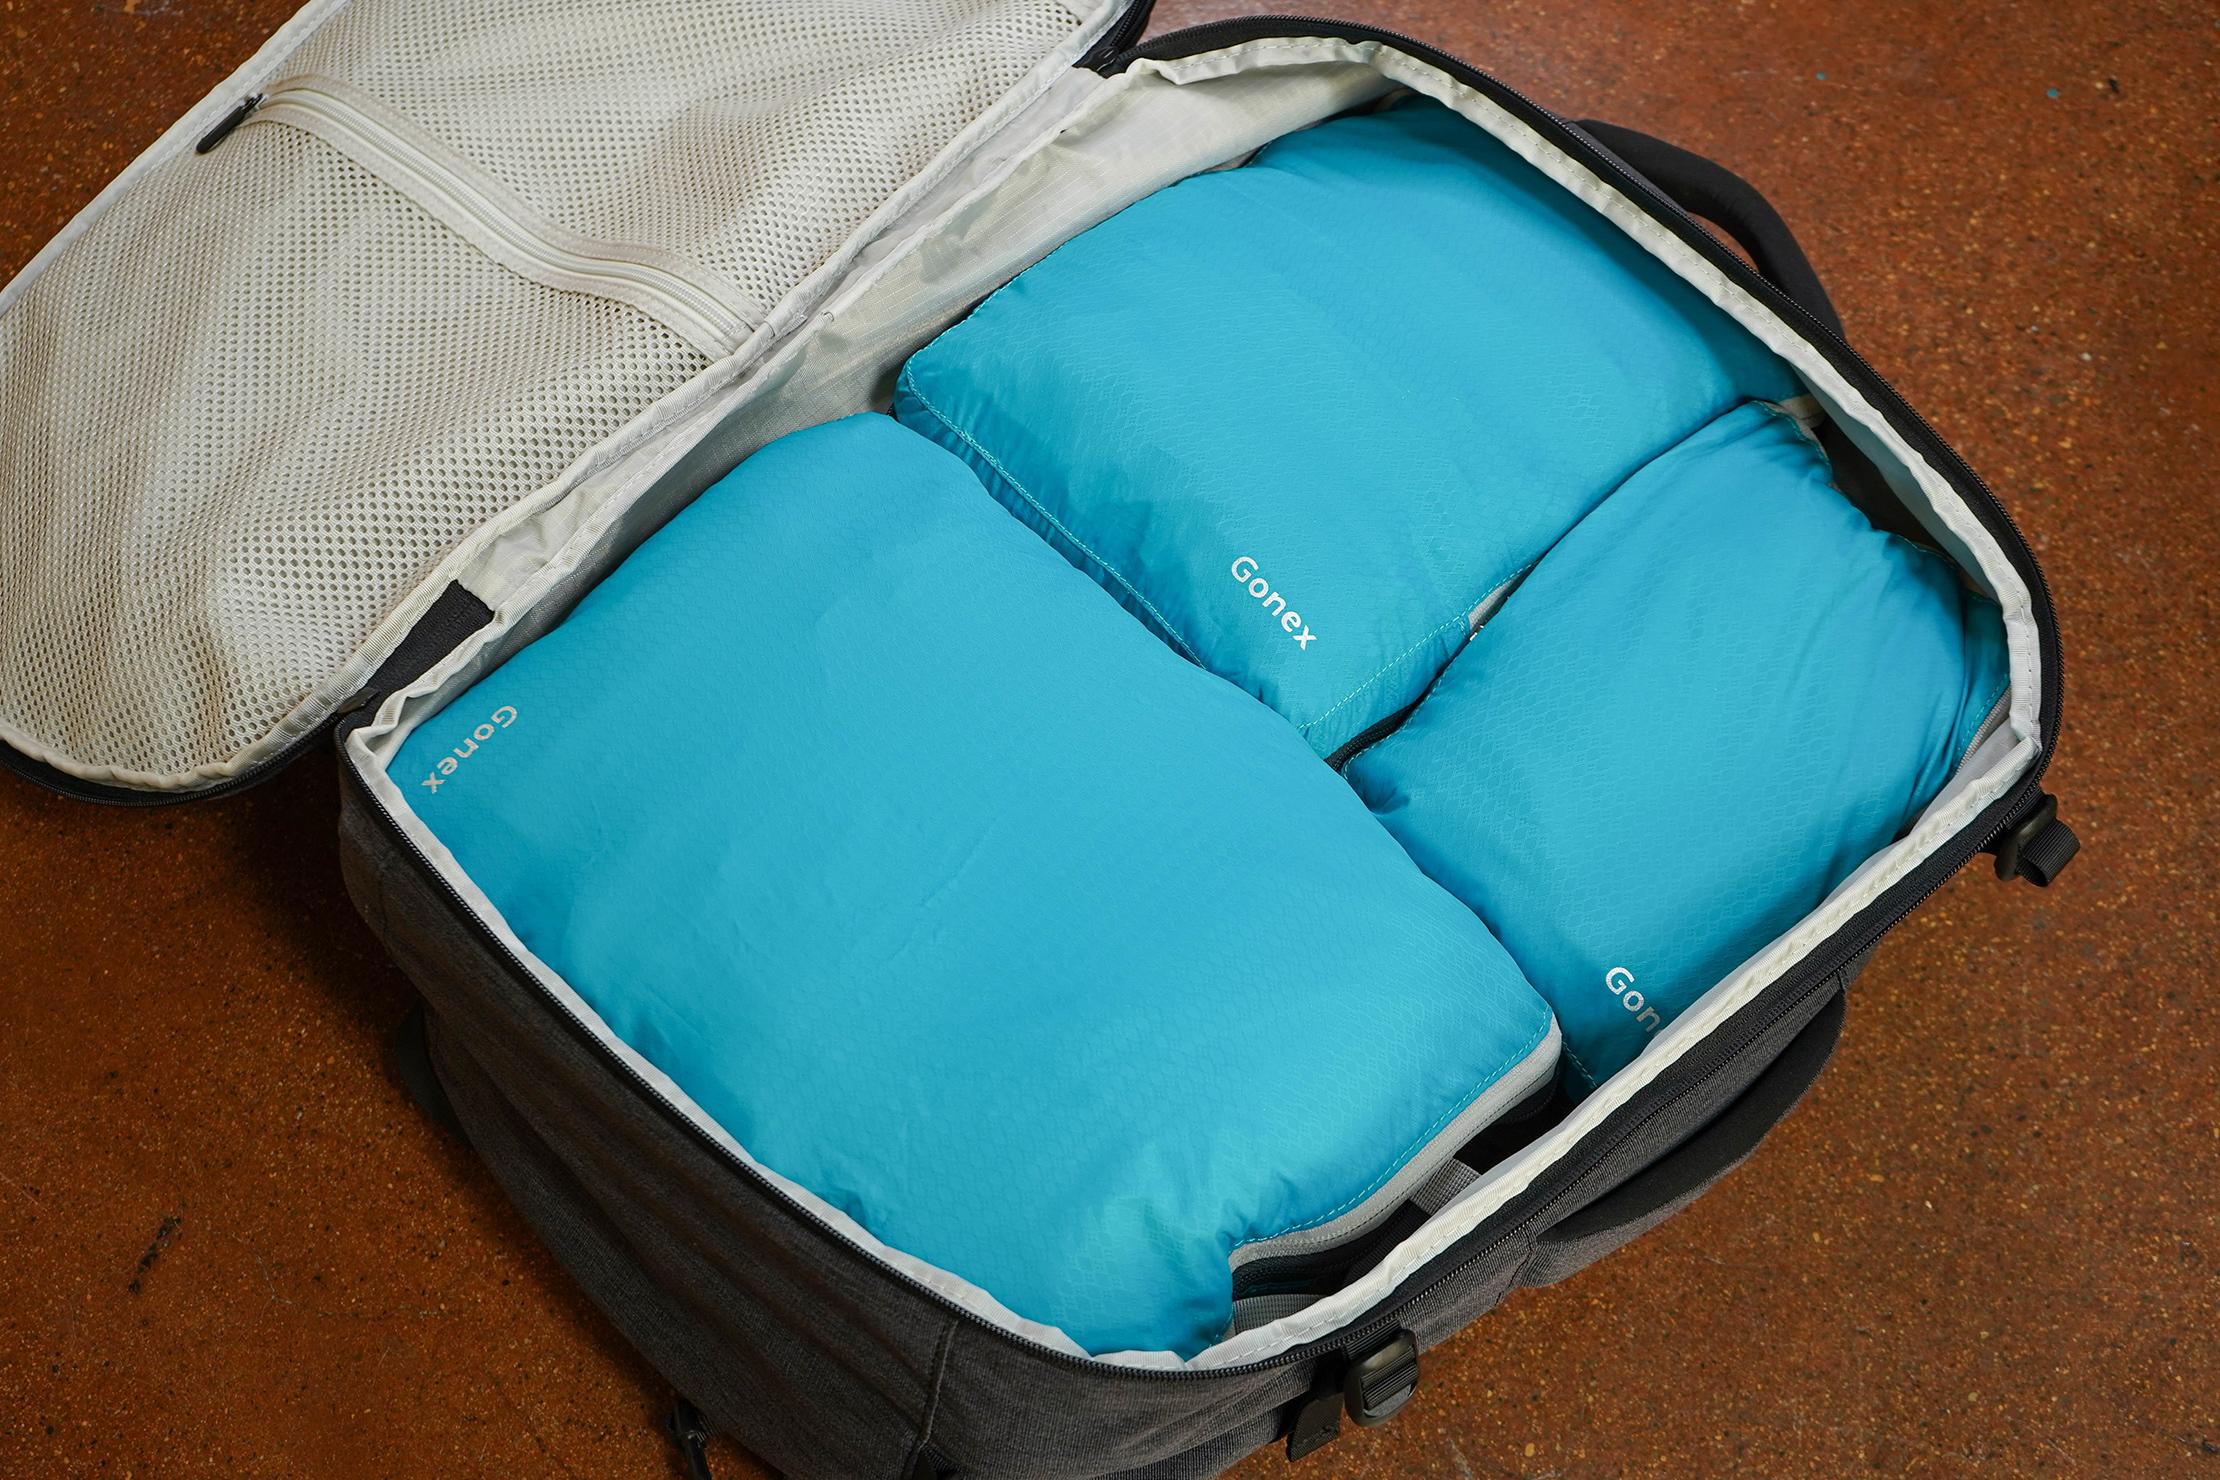 Gonex Compression Packing Cubes In Bag